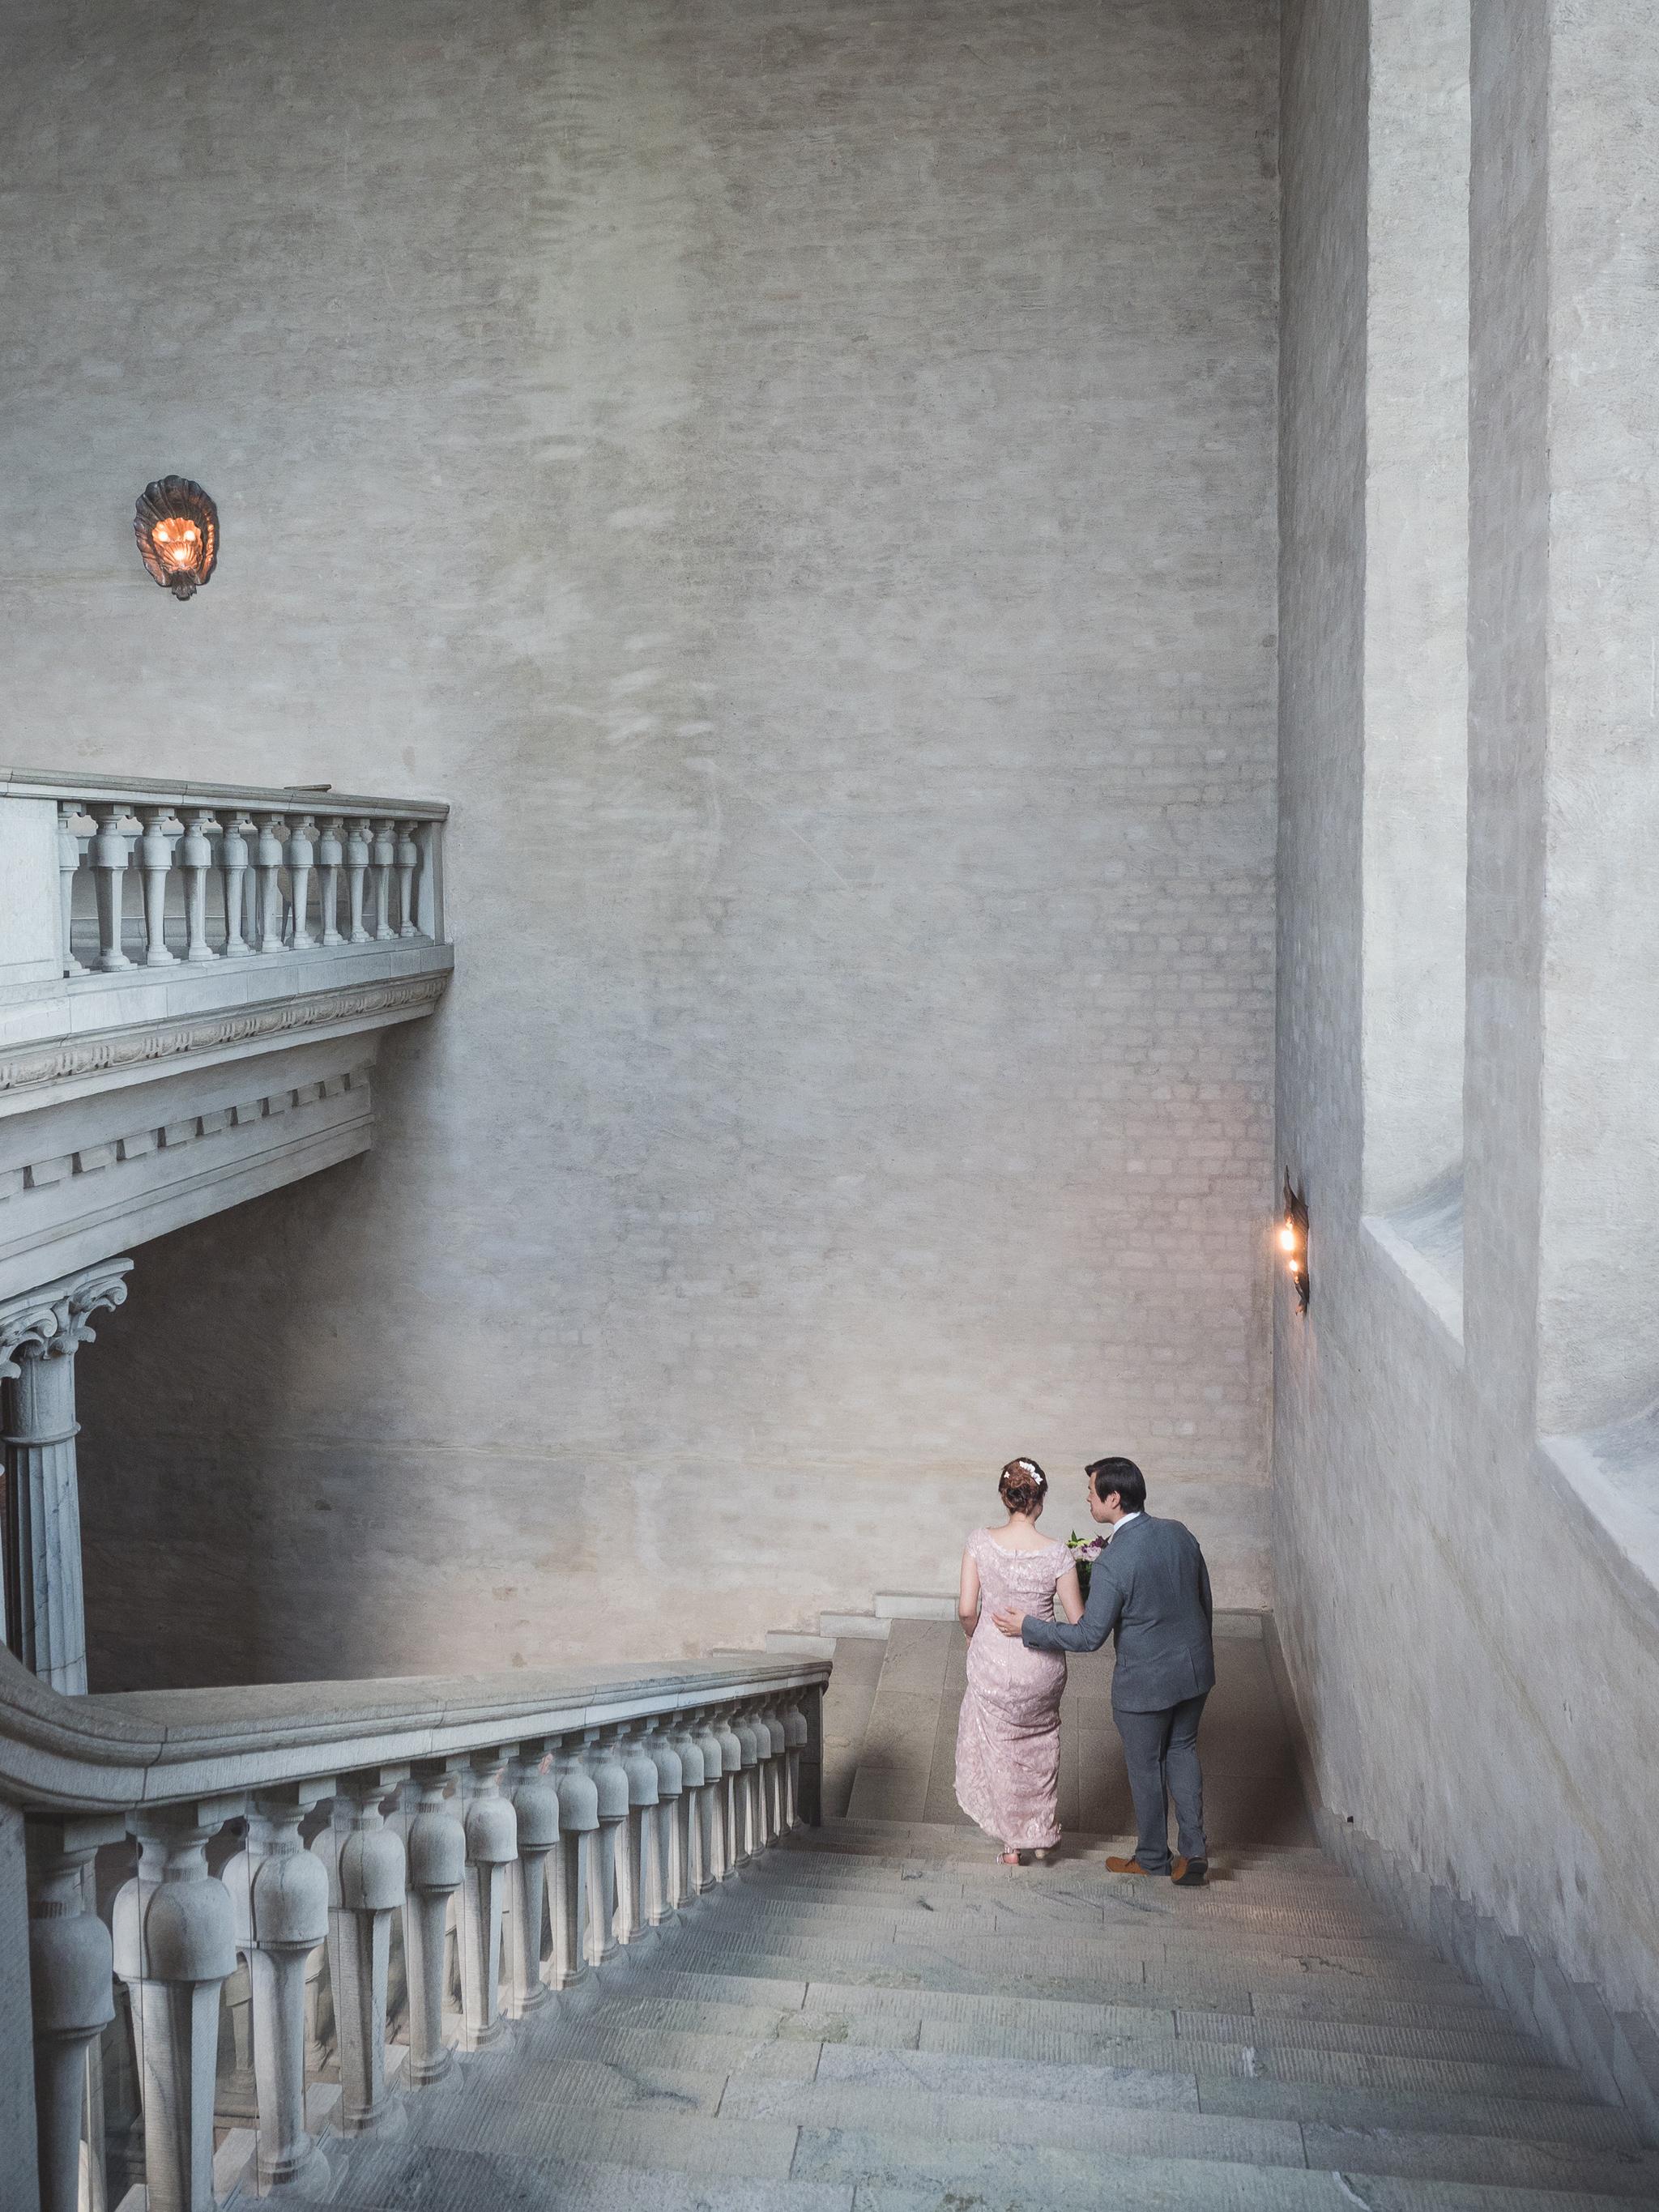 brollopsfotograf stockholms stadshus